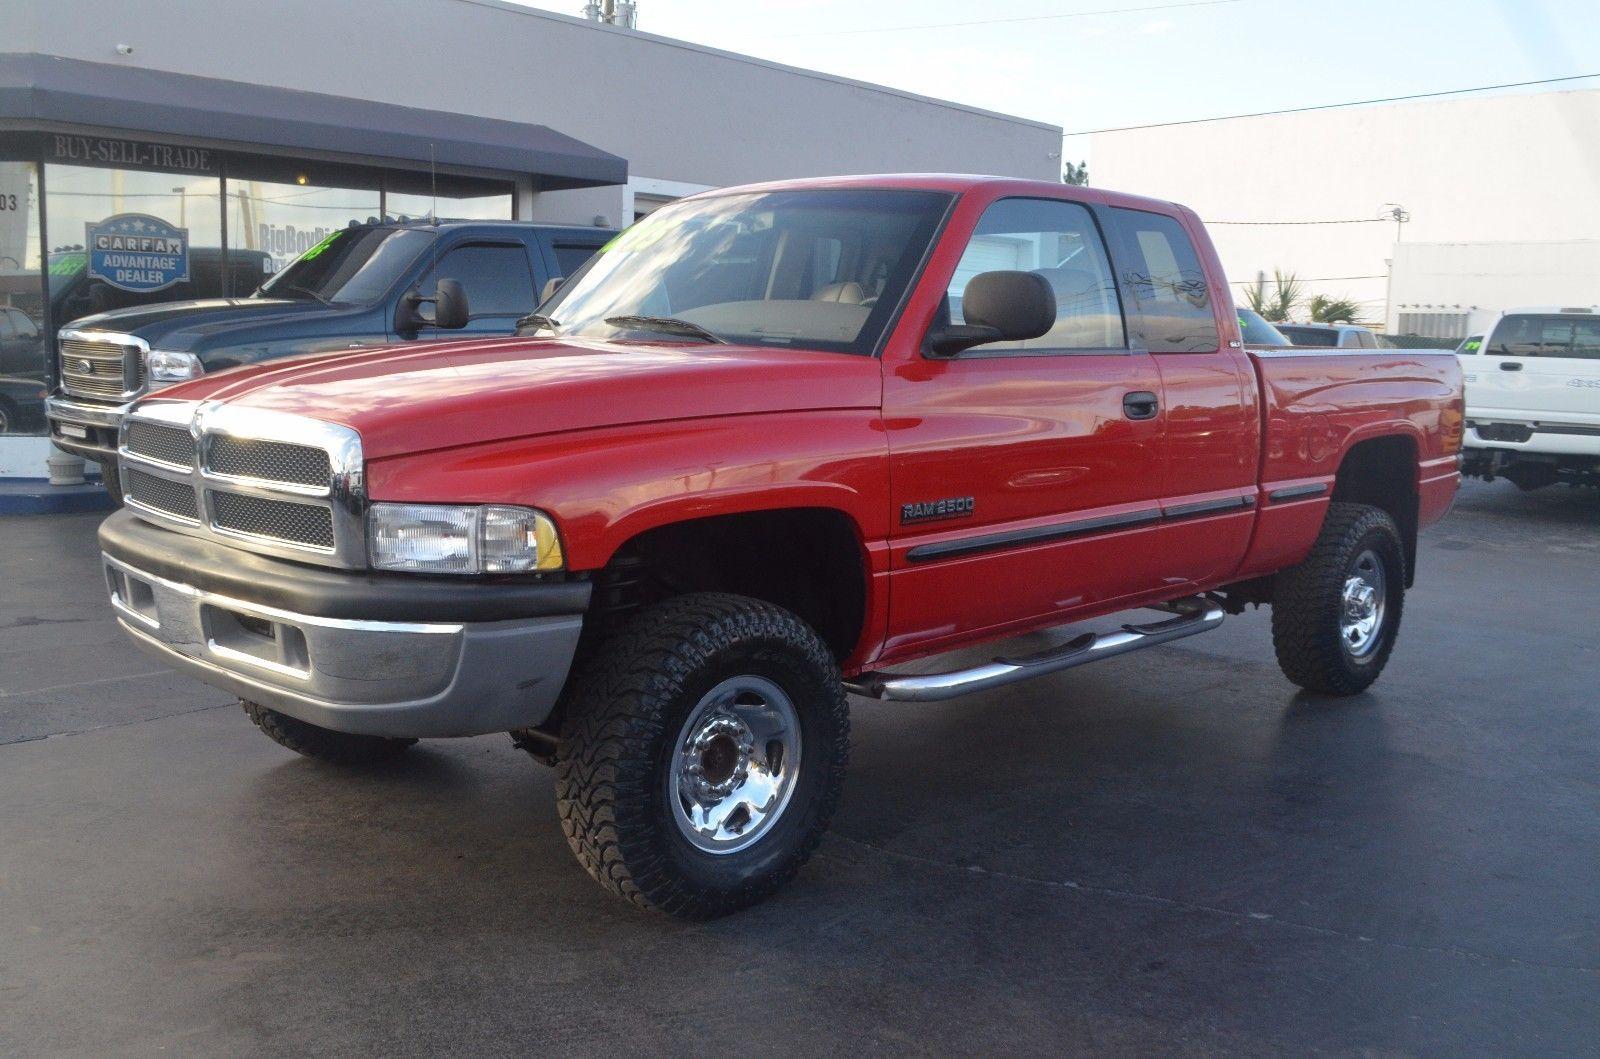 1999 Dodge Ram 2500 Slt Laramie 1999 Dodge Ram 2500 Laramie Slt 5 9 Cummins Turbo Diesel 4x4 Leather Shipping 2018 2019 24carshop Com